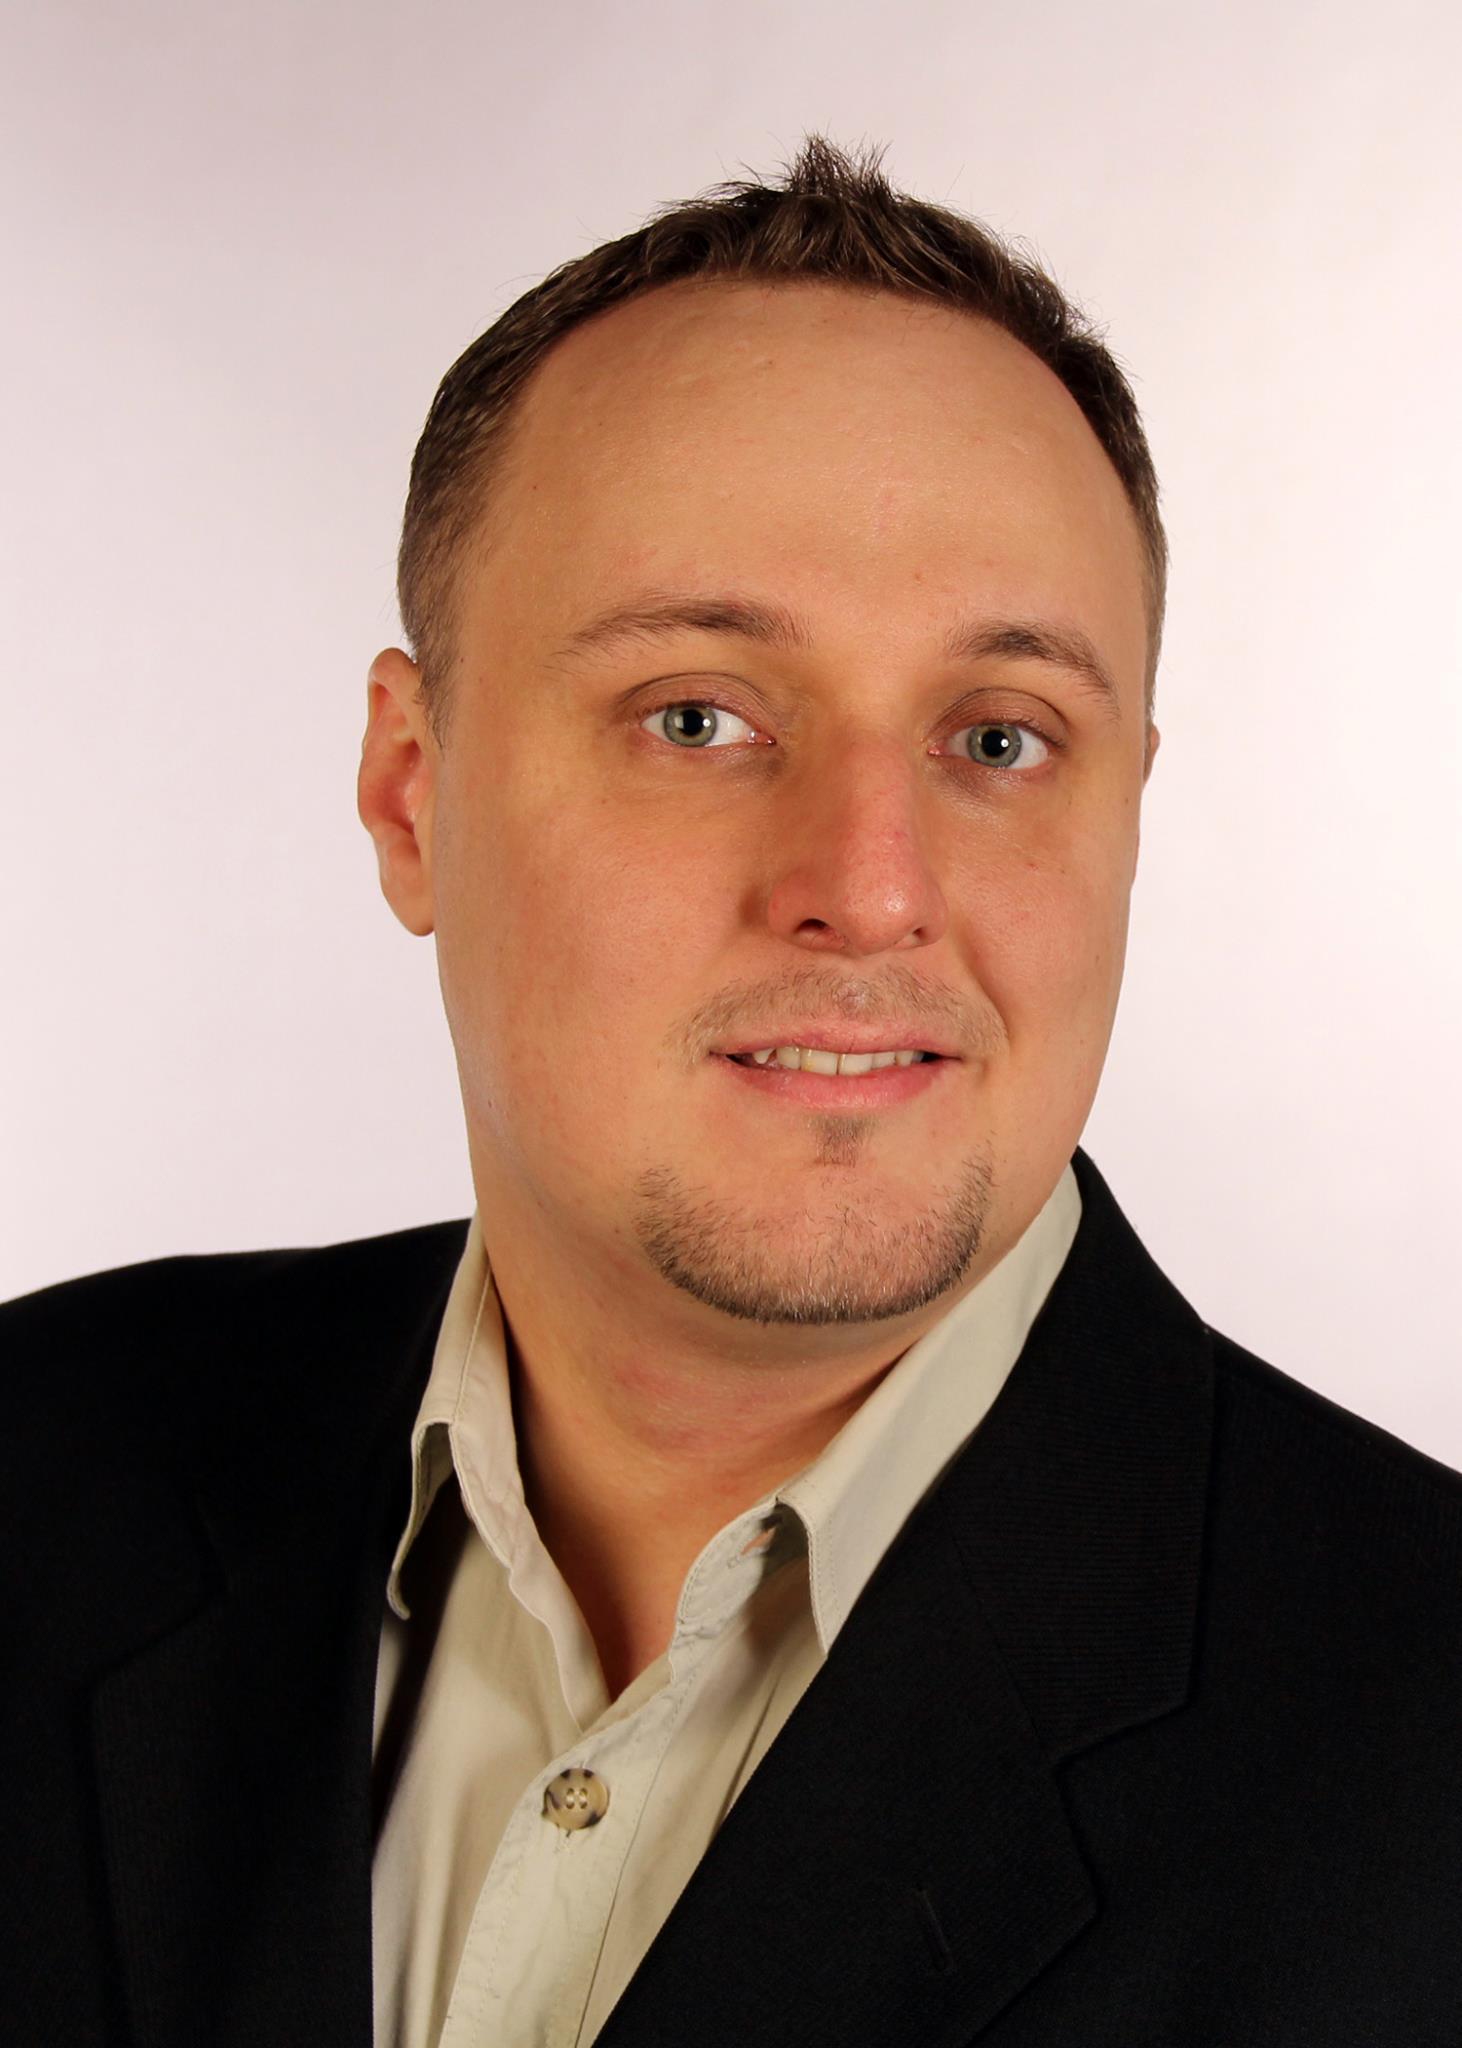 Michael Hablesreiter